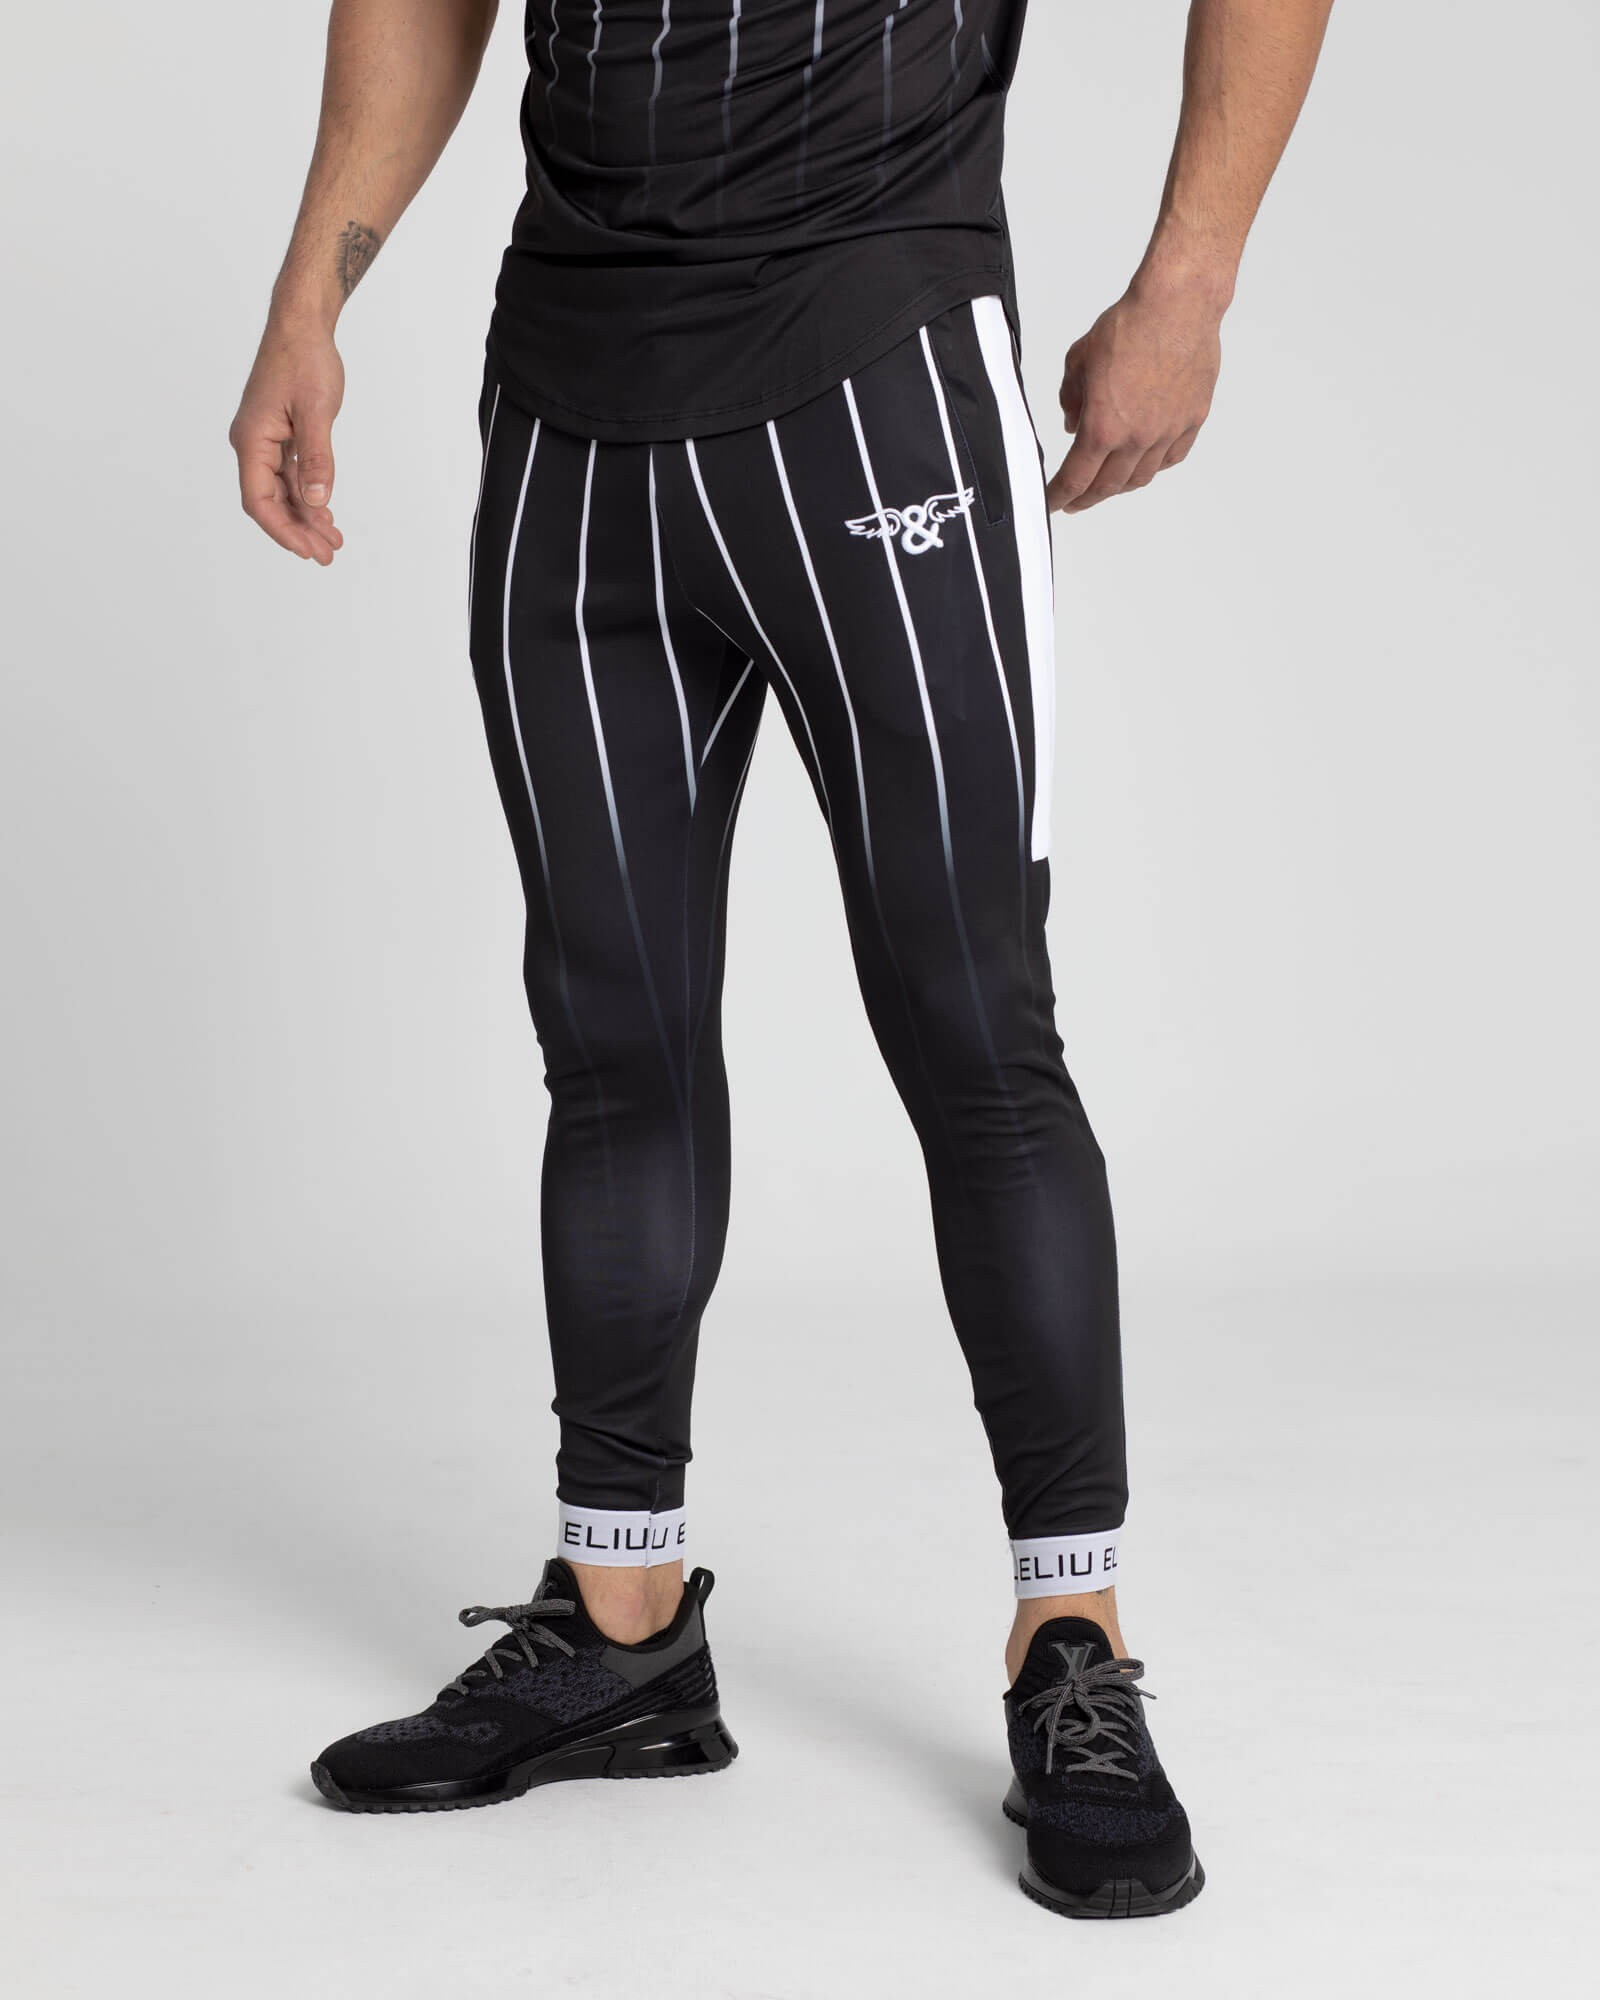 Pantalones de chándal Stripes. Estilo urbano de ELIU streetwear.